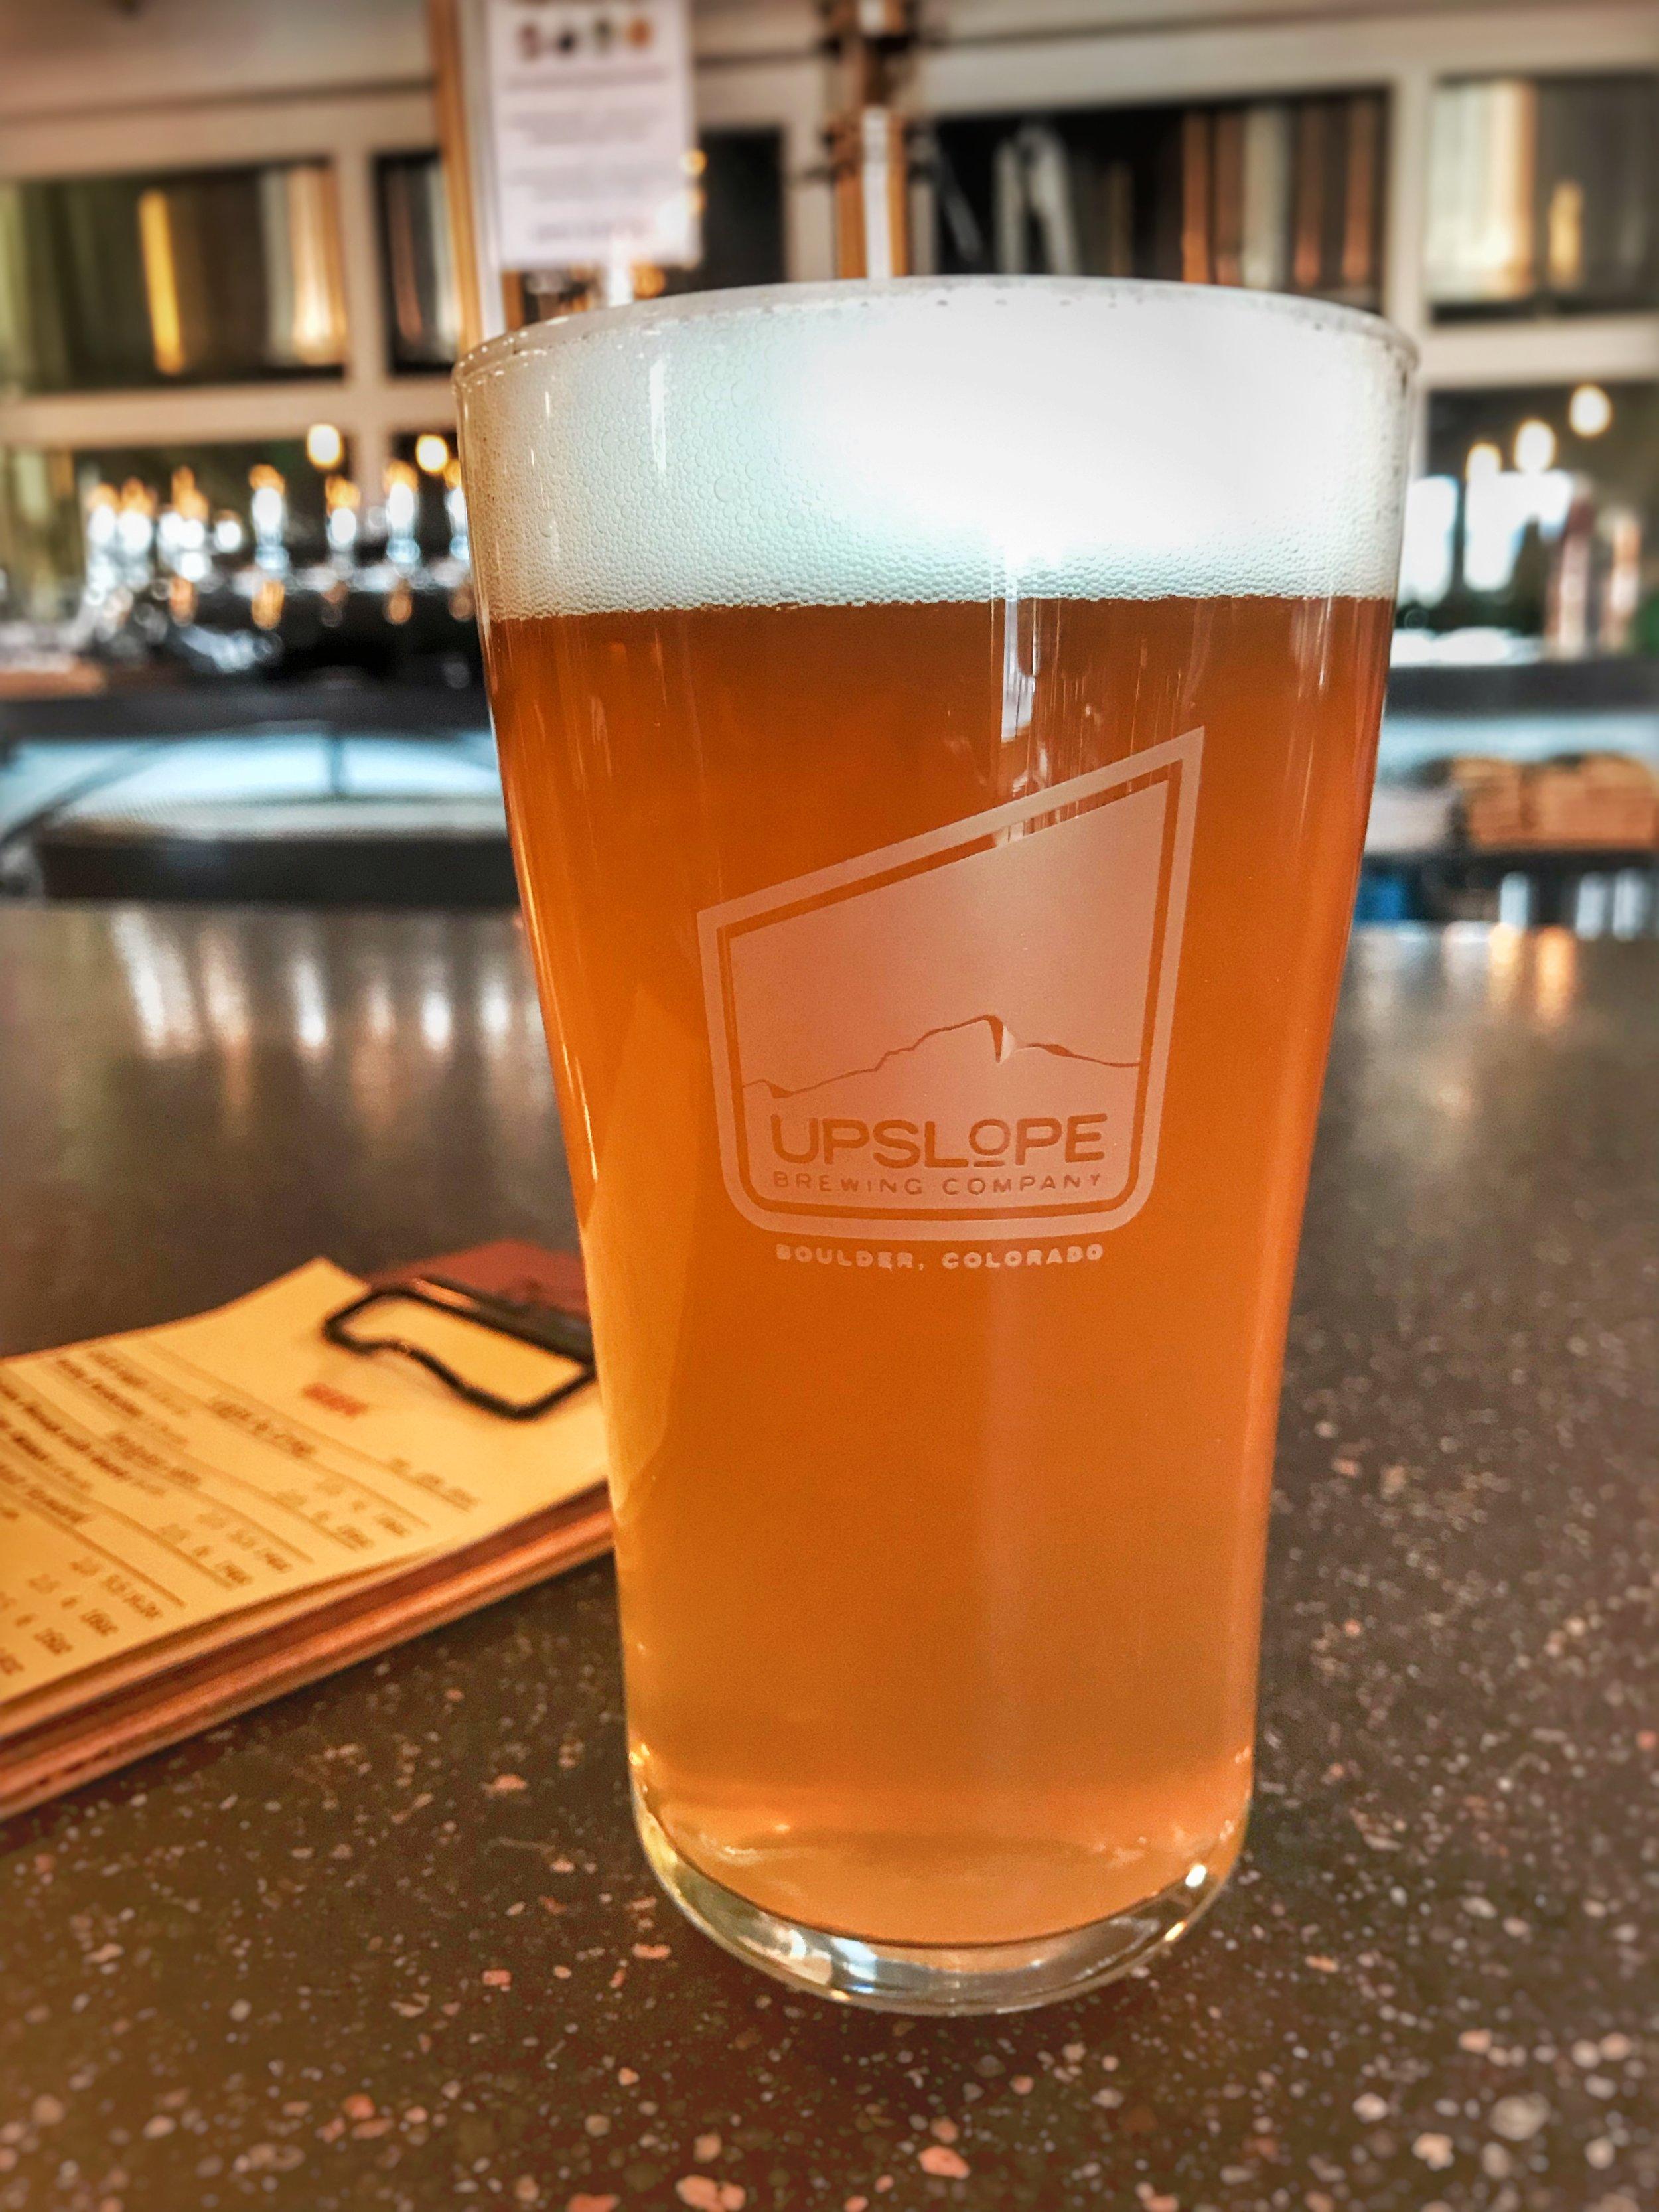 Upslope Brewing Company, Boulder, Colorado